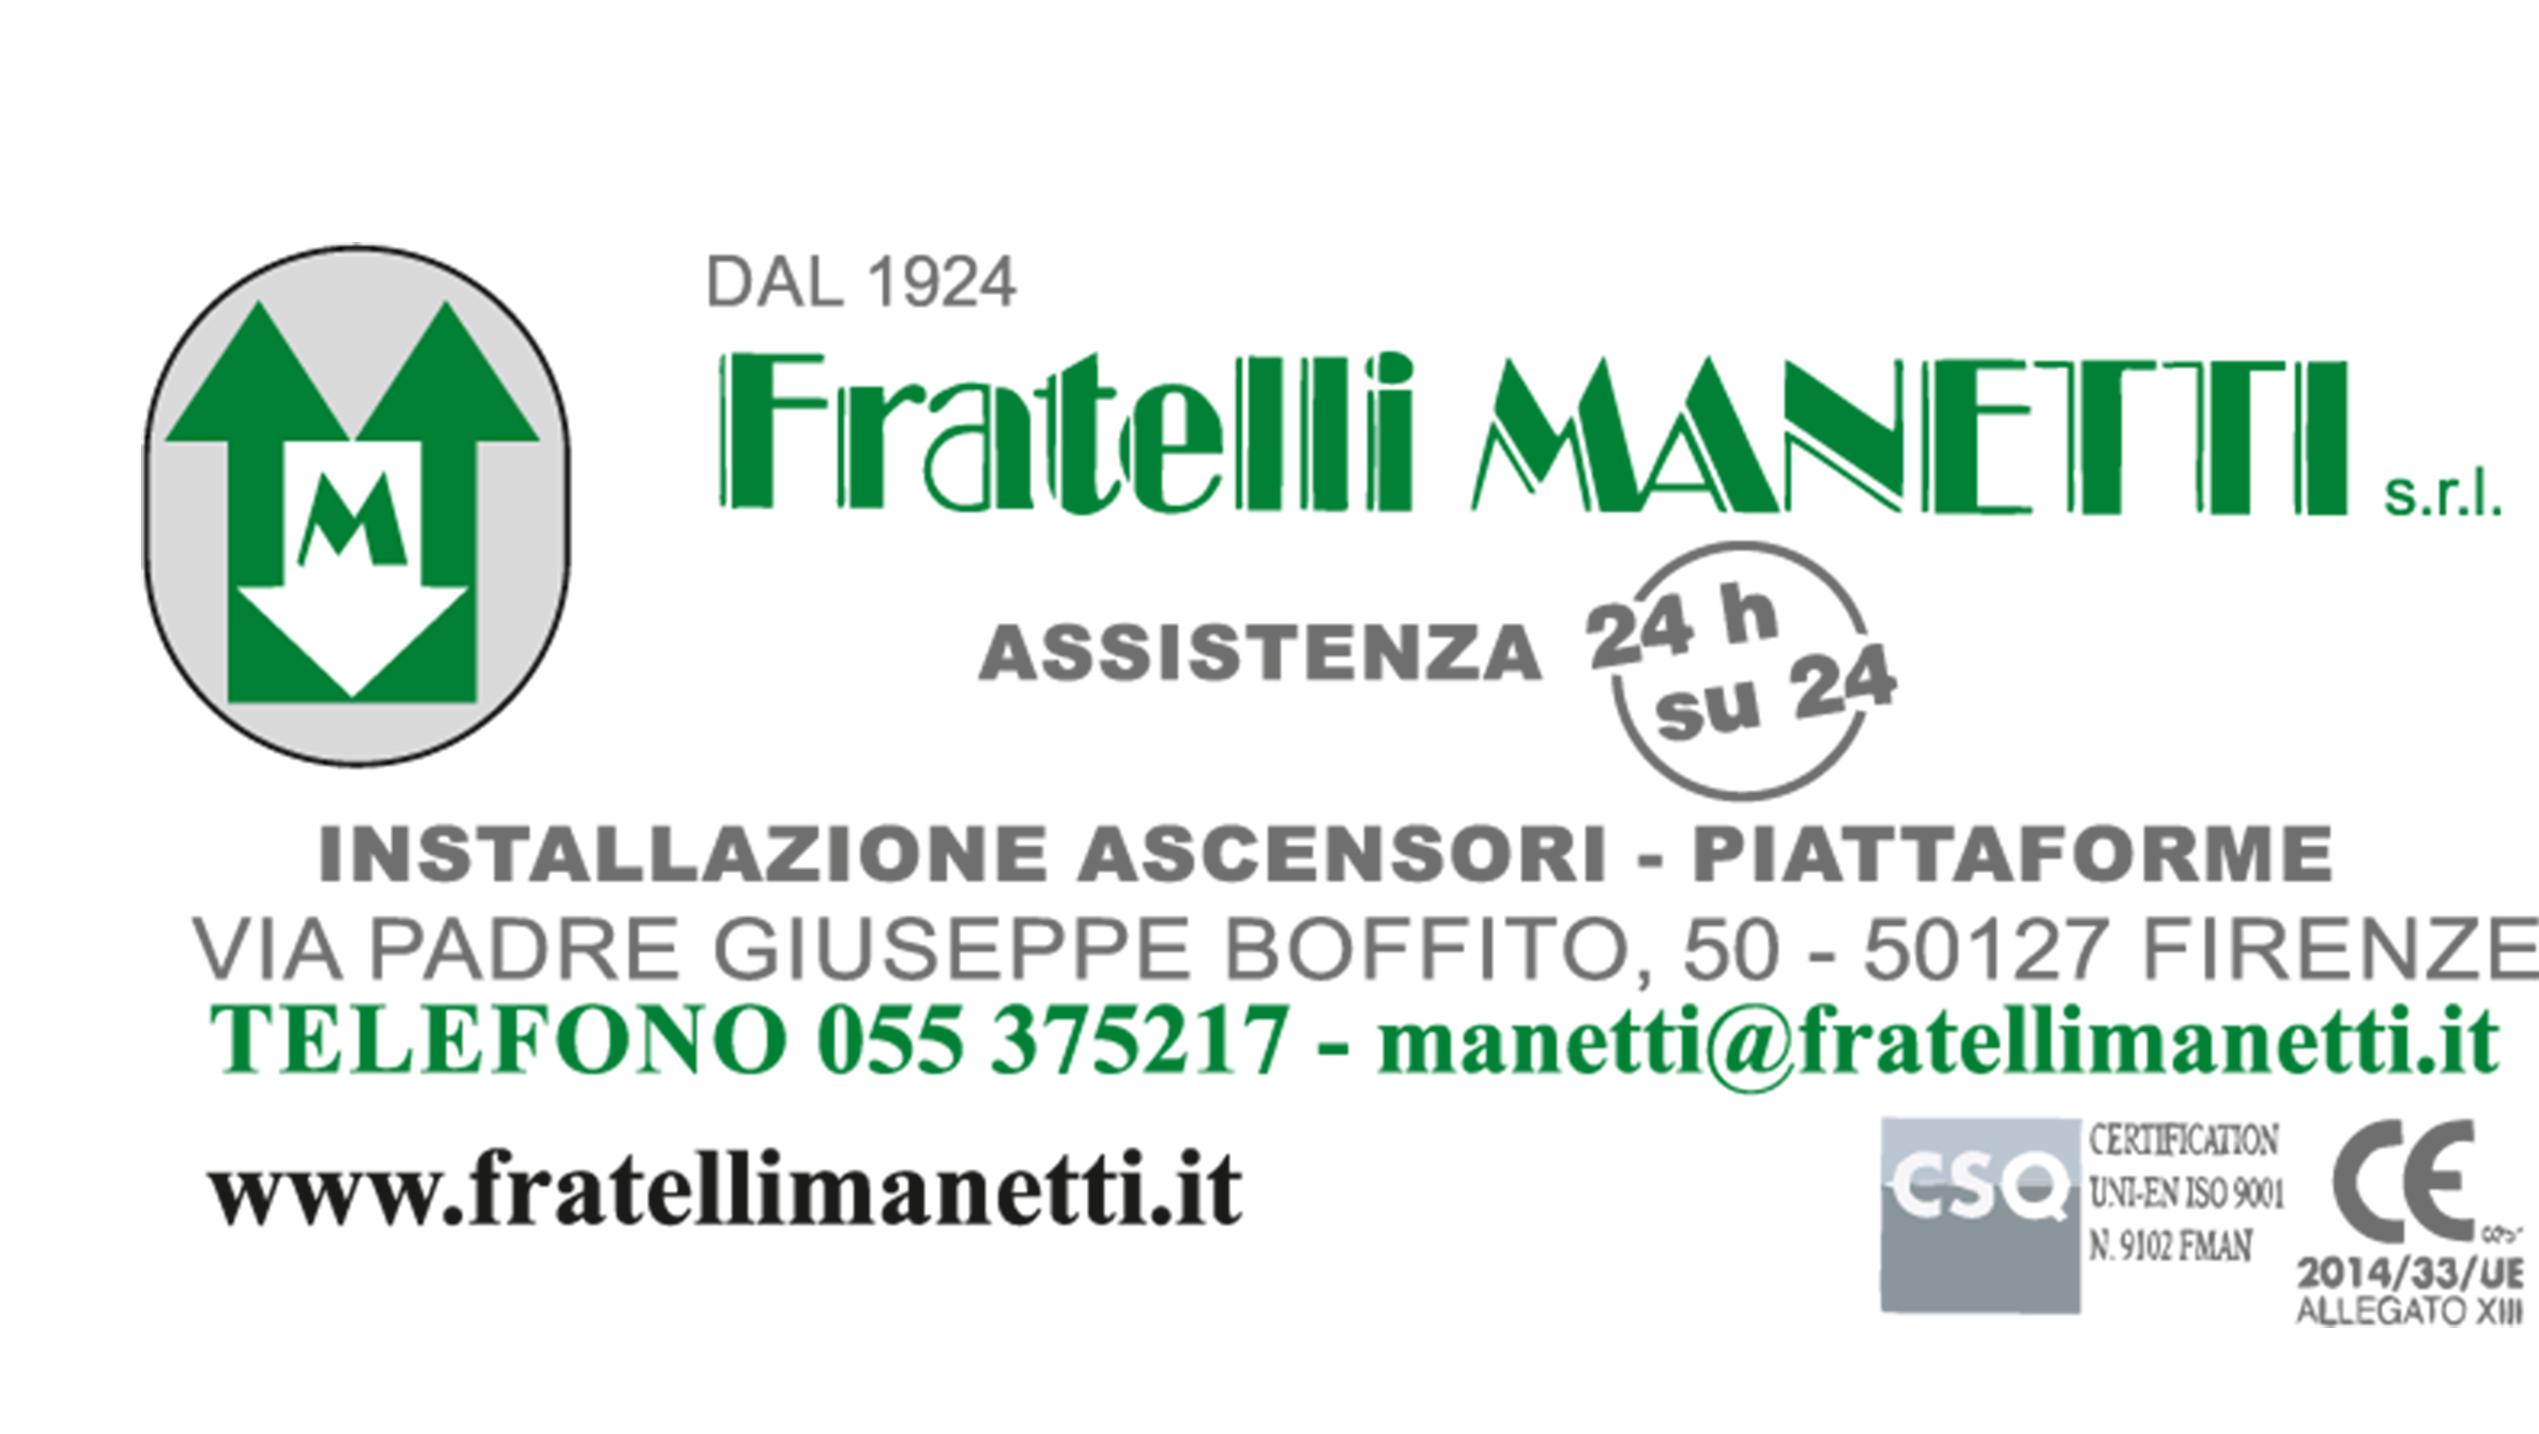 Fratelli Manetti